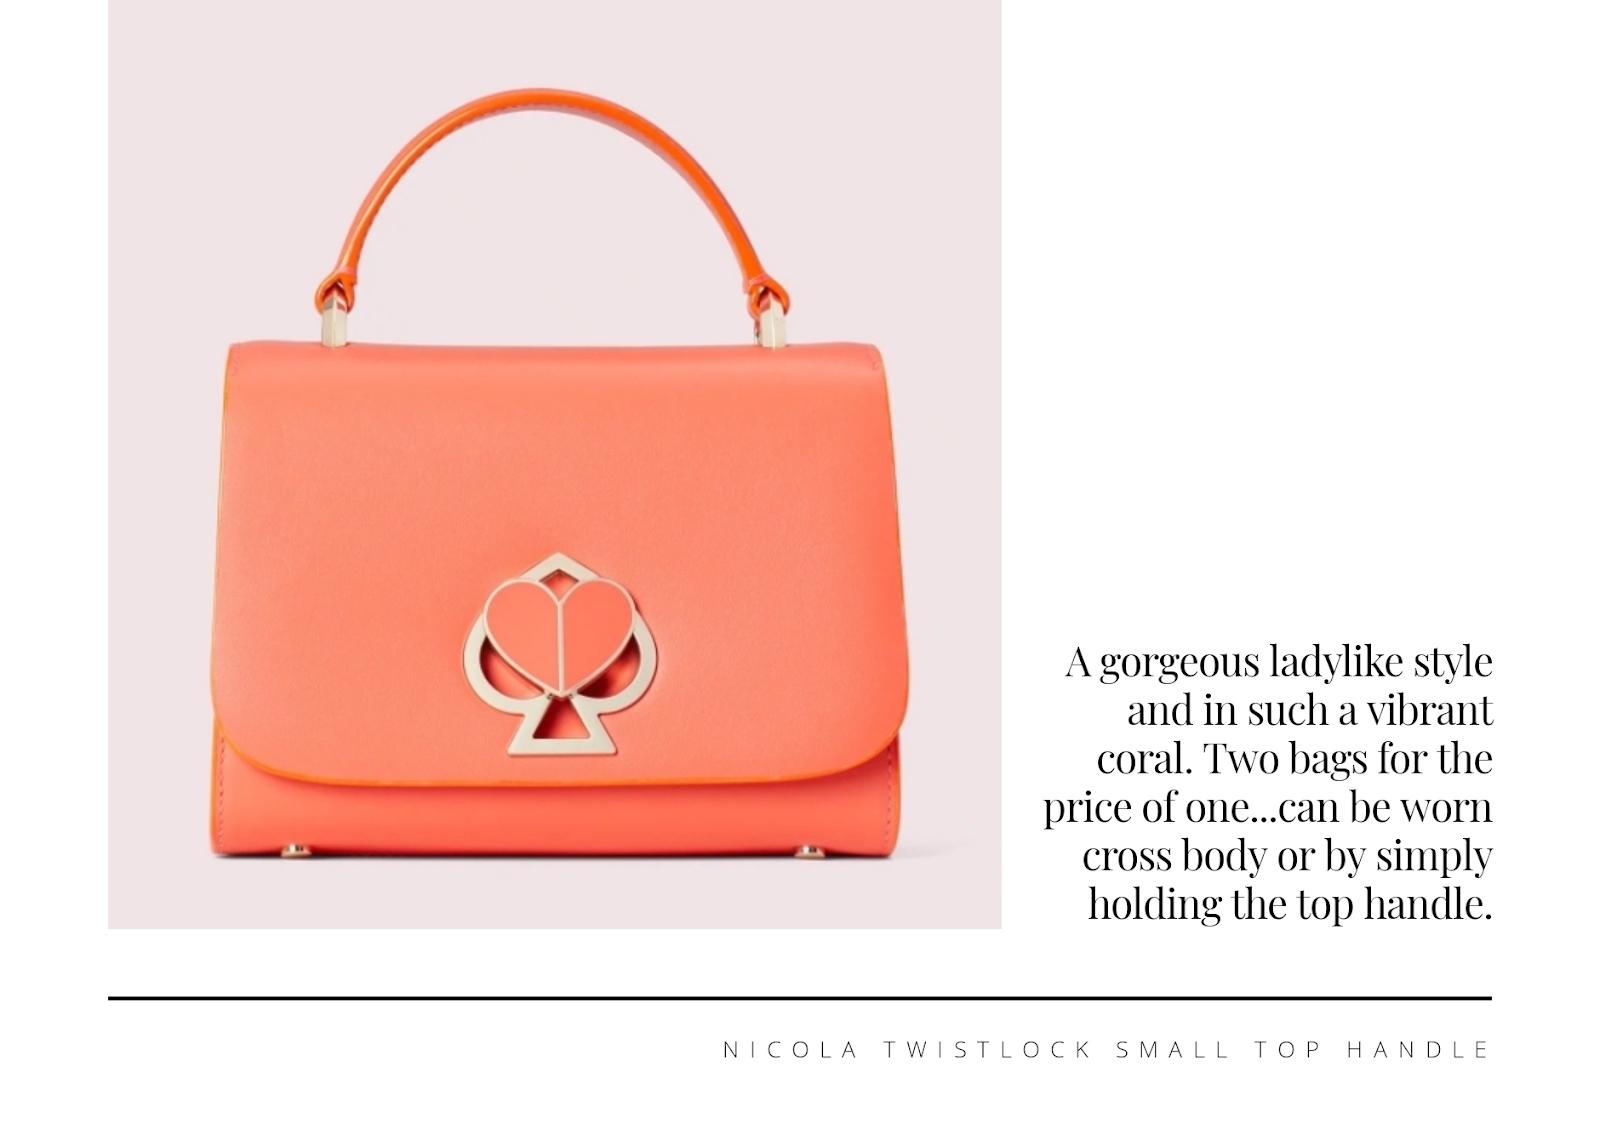 Kate Spade: Nicola Twistlock small top handle